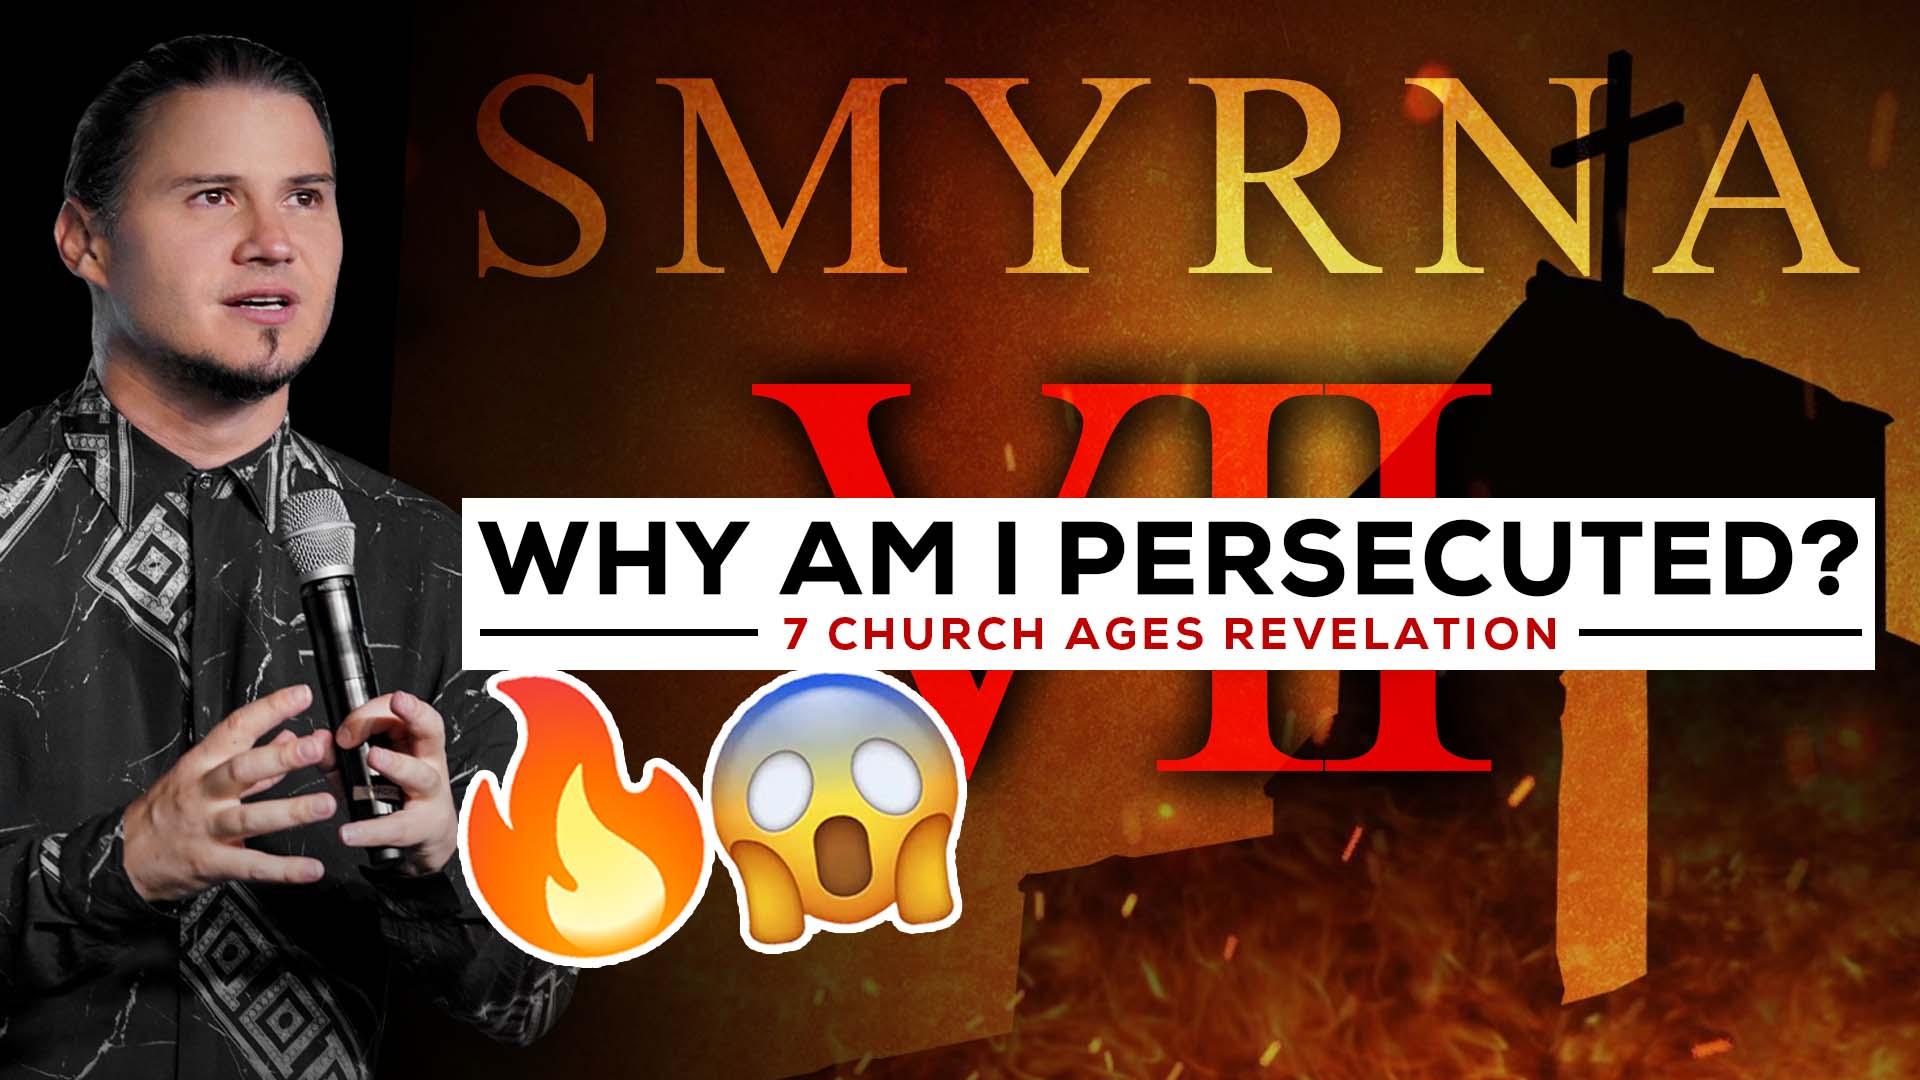 Smyrna – Why Am I Persecuted?